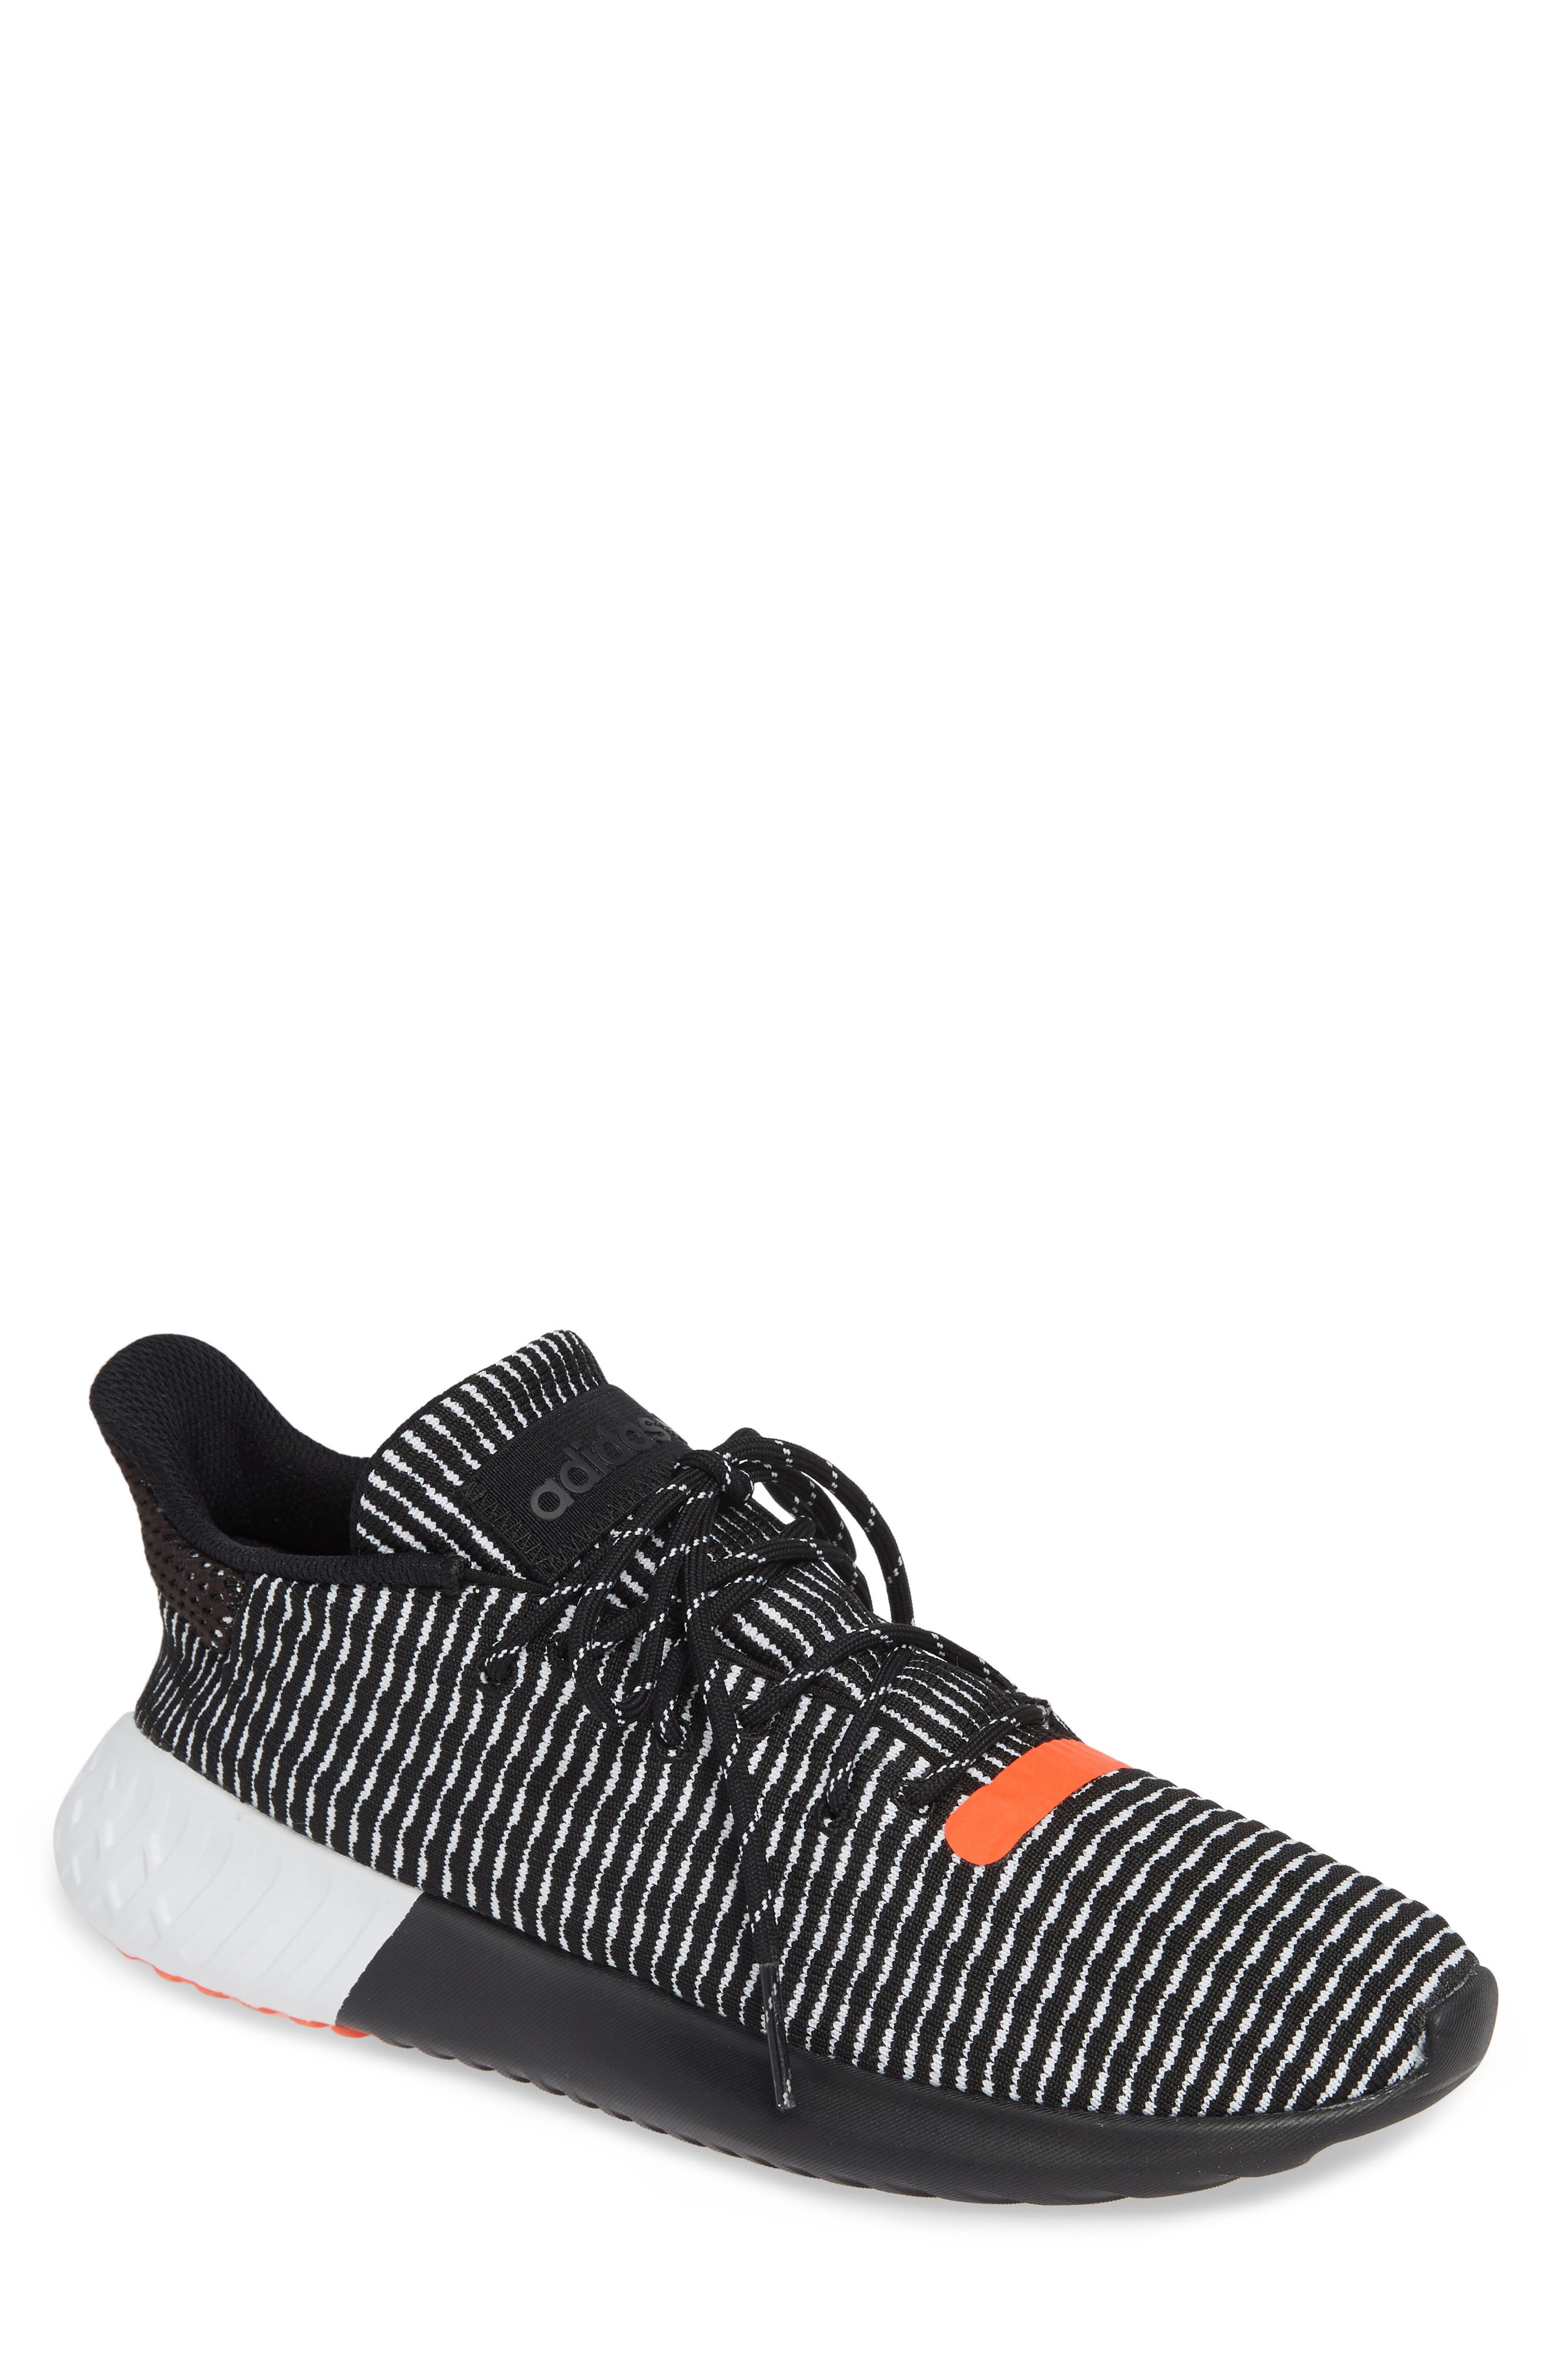 3d2876db9ed Adidas Originals Tubular Dusk Primeknit Sneaker In Black  White  Solar Red